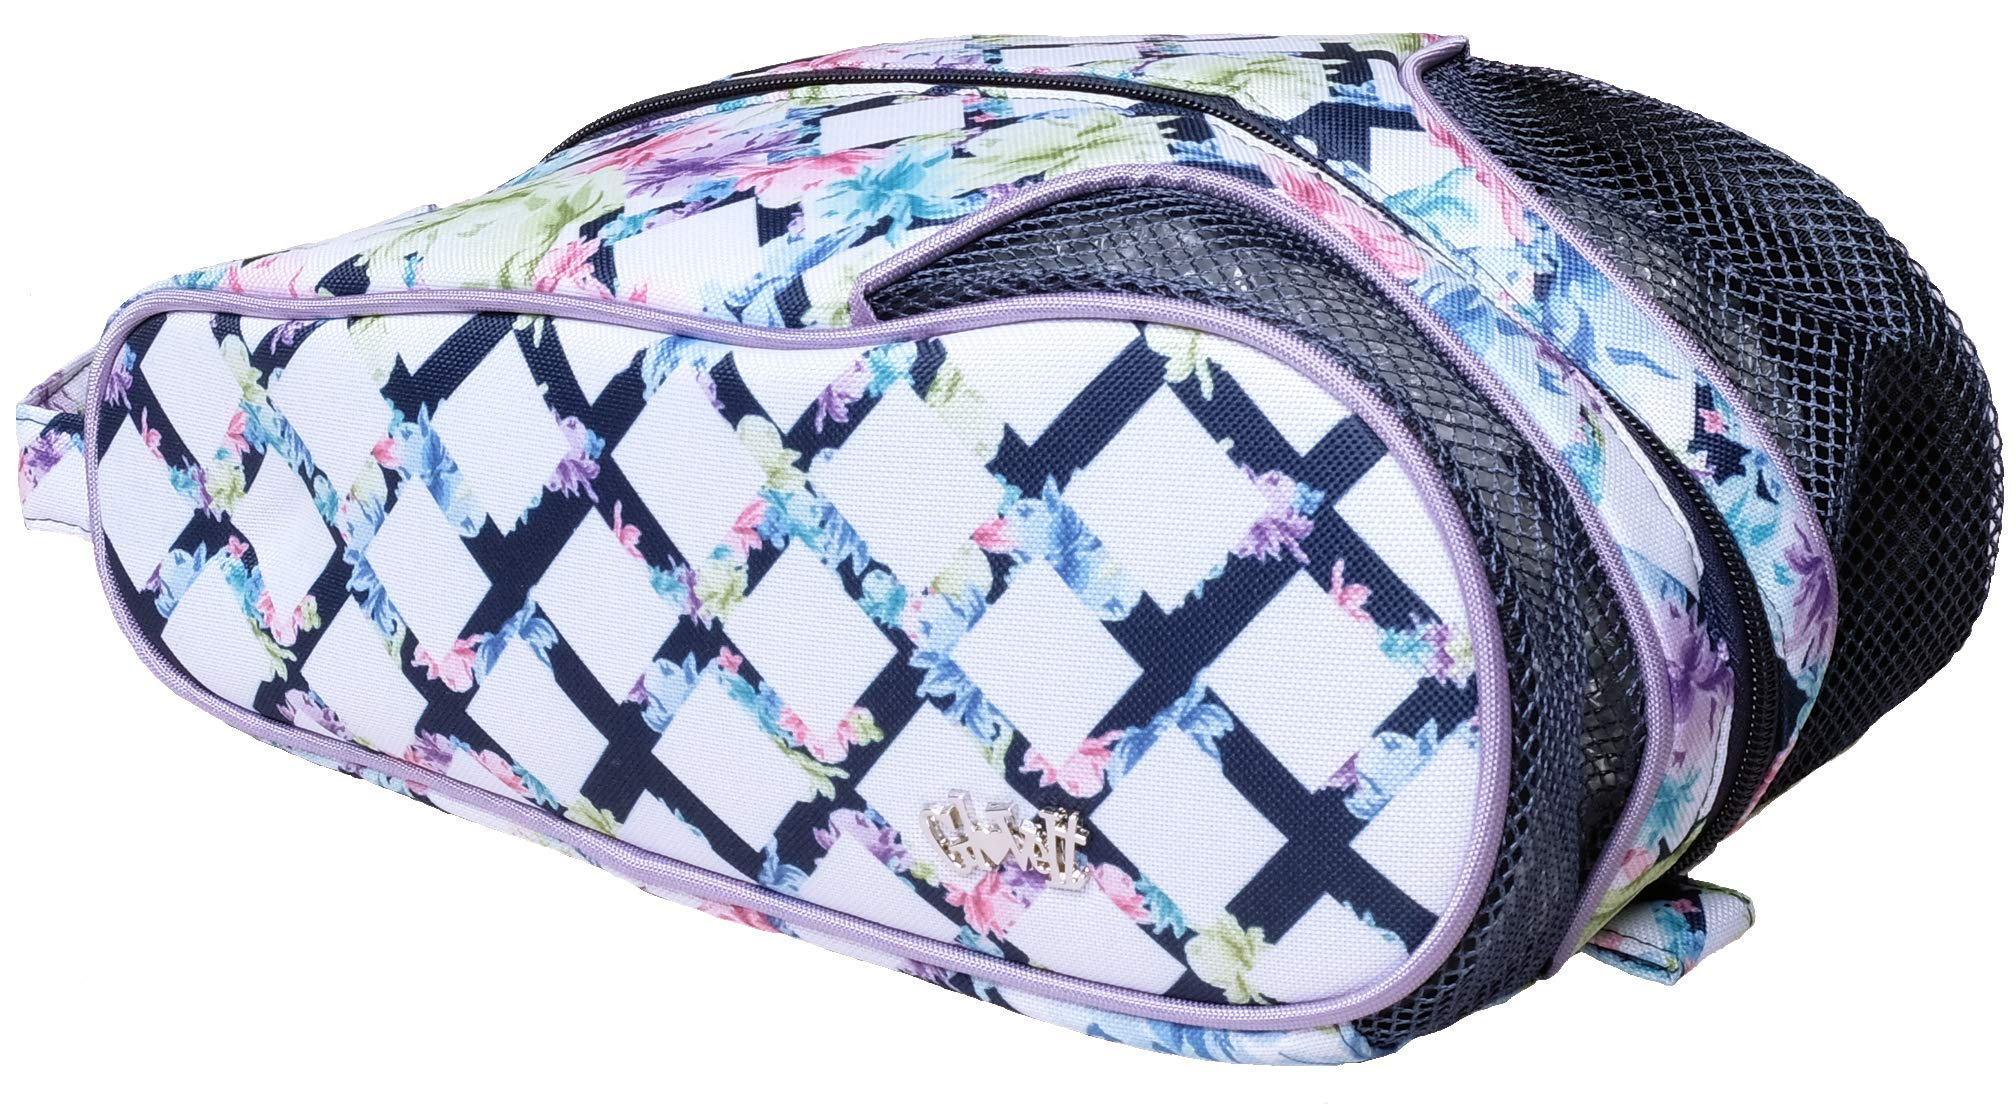 Glove It Women's Shoe Bag Ladies Shoe Bags for Travel & Storage - Womens Shoes Carrying Bag - Shoe Organizer - Mesh Air Flow Case - Gym, Sneaker, Traveling, Sports - 2019 Pastel Lattice by Glove It